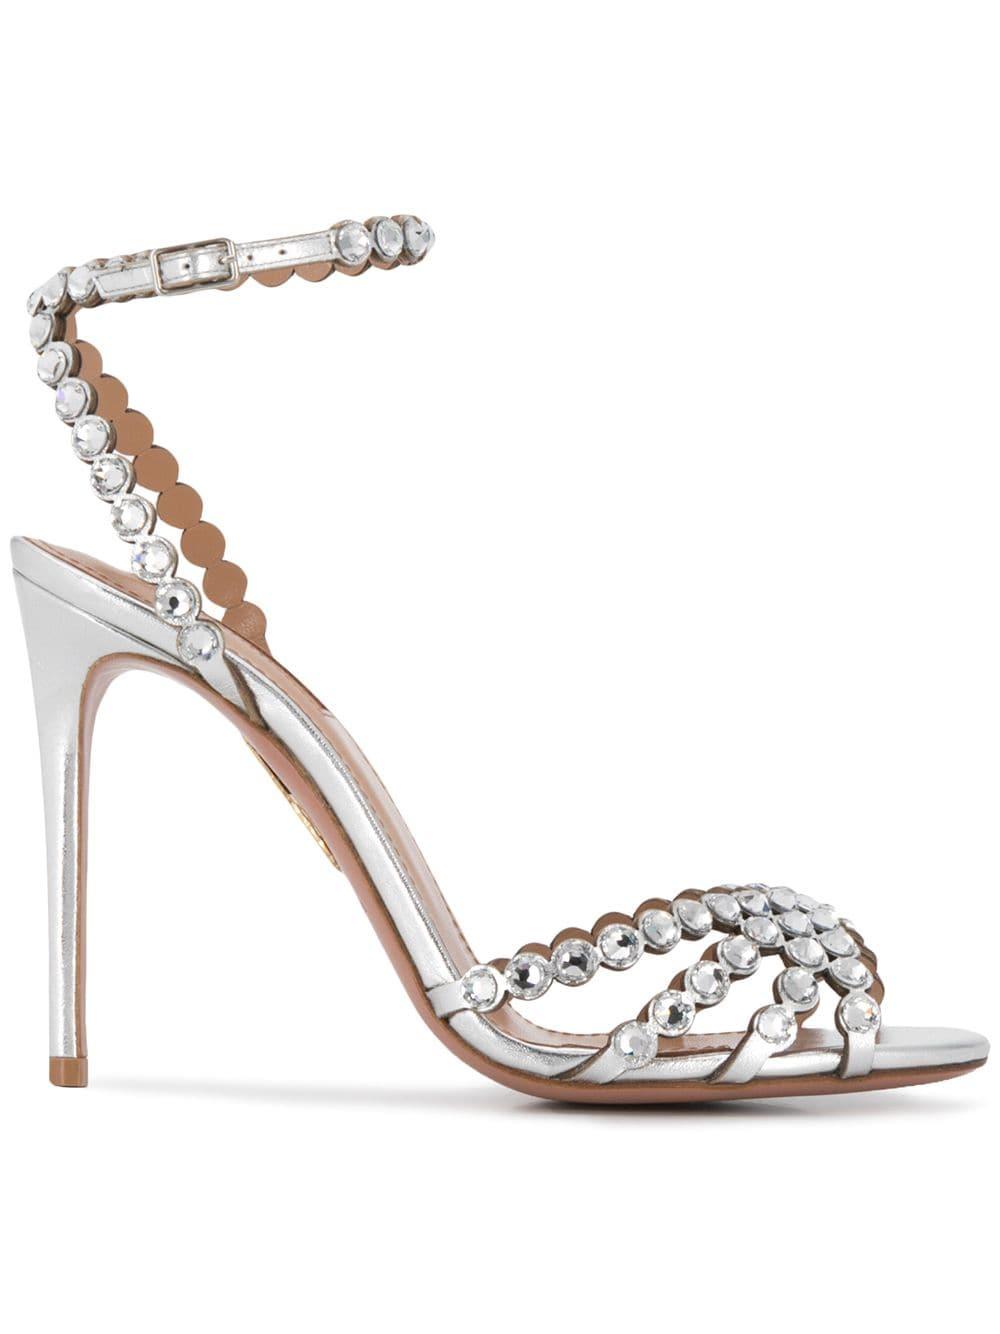 Aquazzura Studio crystal embellished sandals Silver